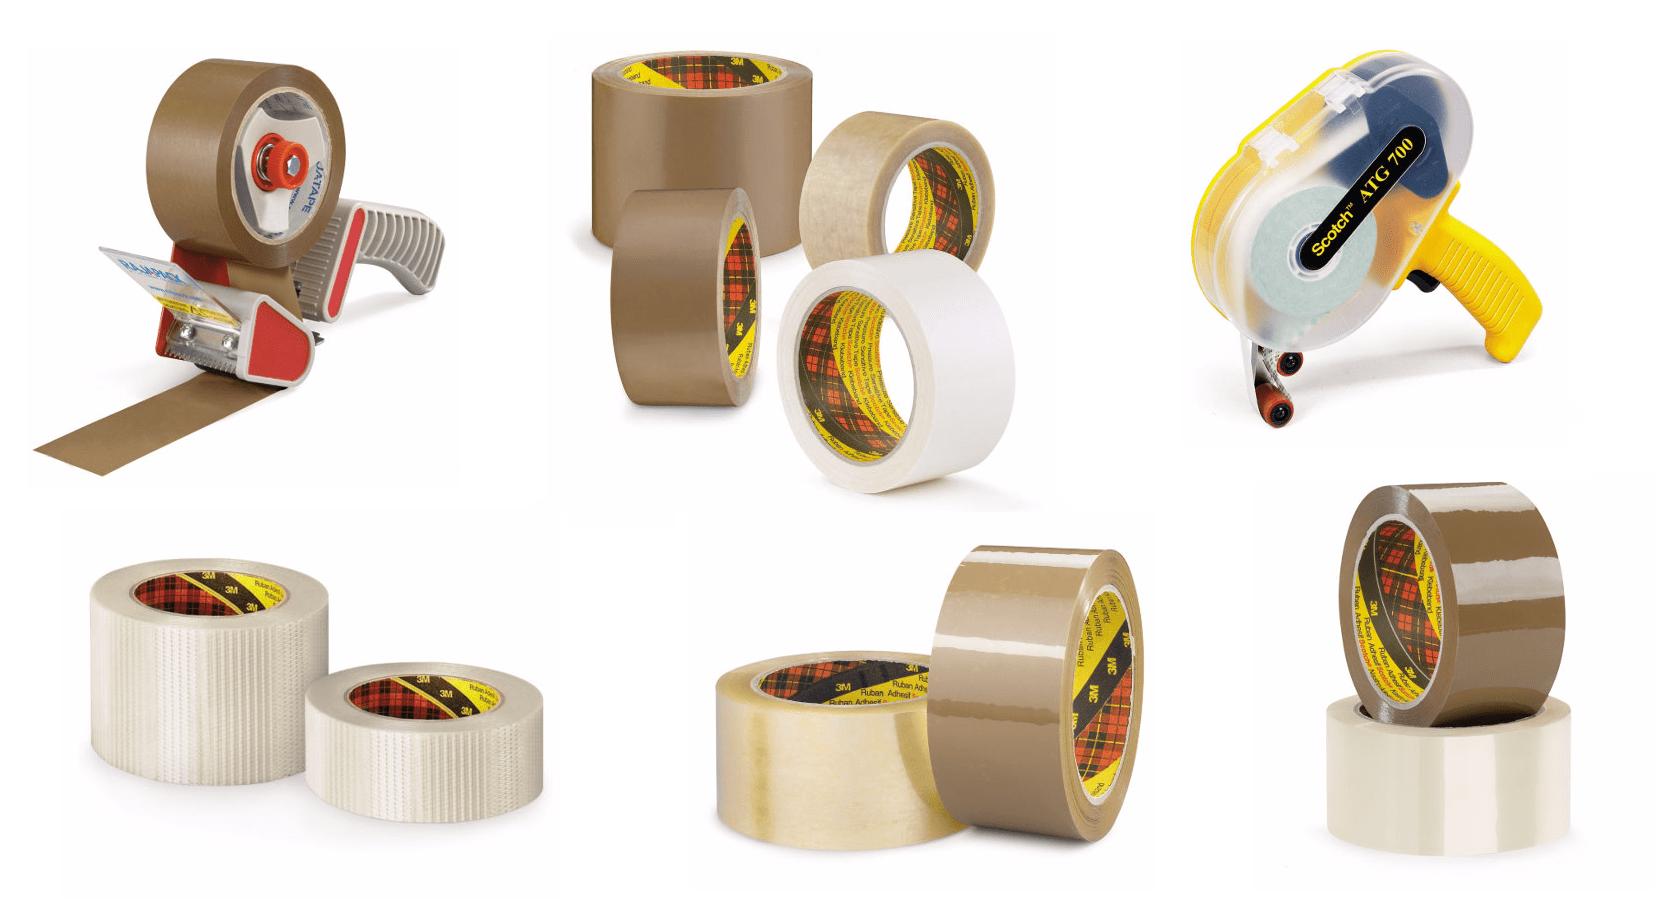 3M™ adhesive tapes - 3M Scotch Tape